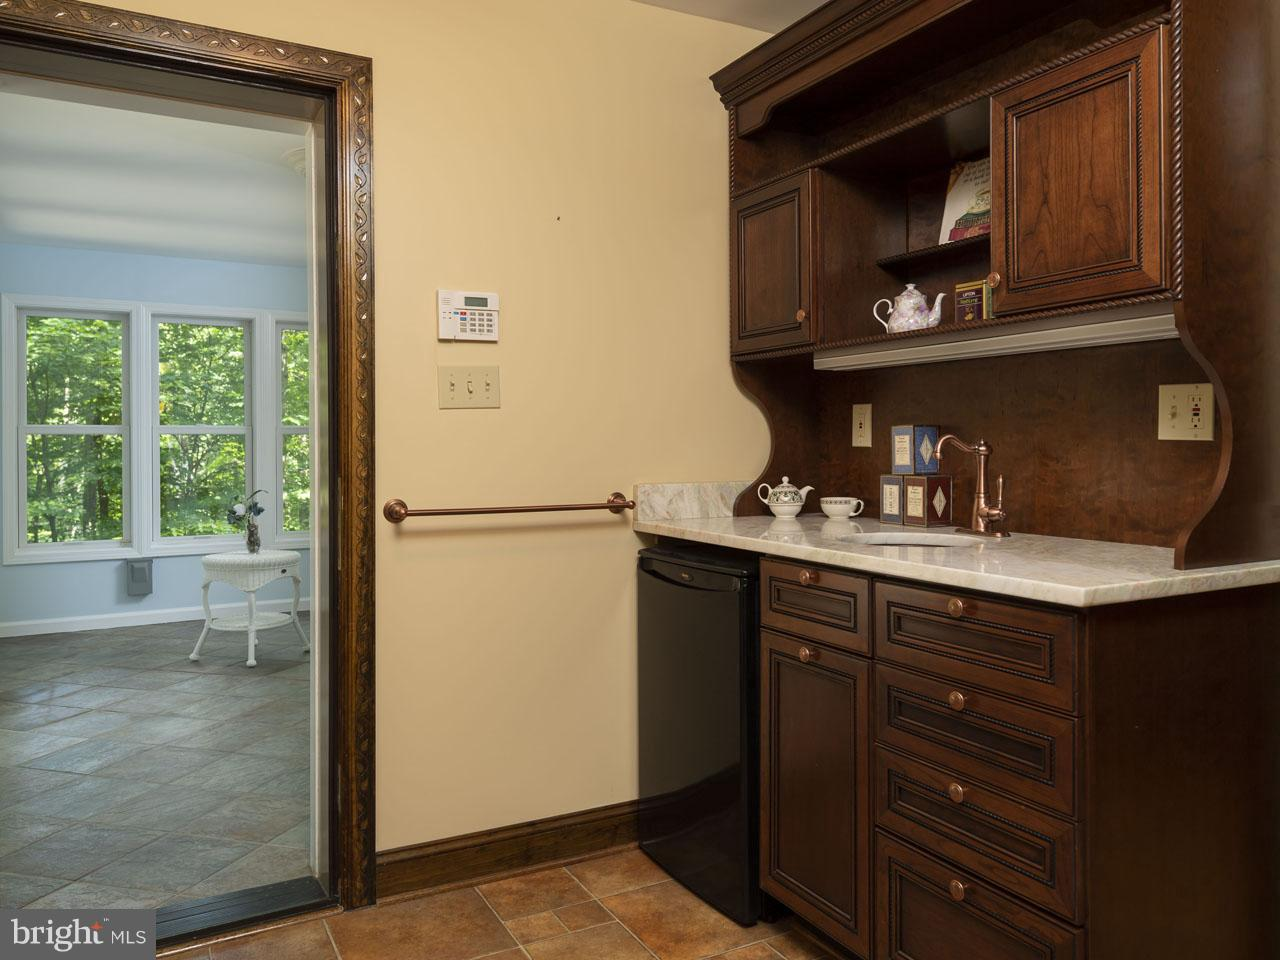 1002303700-300502418966-2021-07-22-03-27-22  |   | Alexandria Delaware Real Estate For Sale | MLS# 1002303700  - Best of Northern Virginia